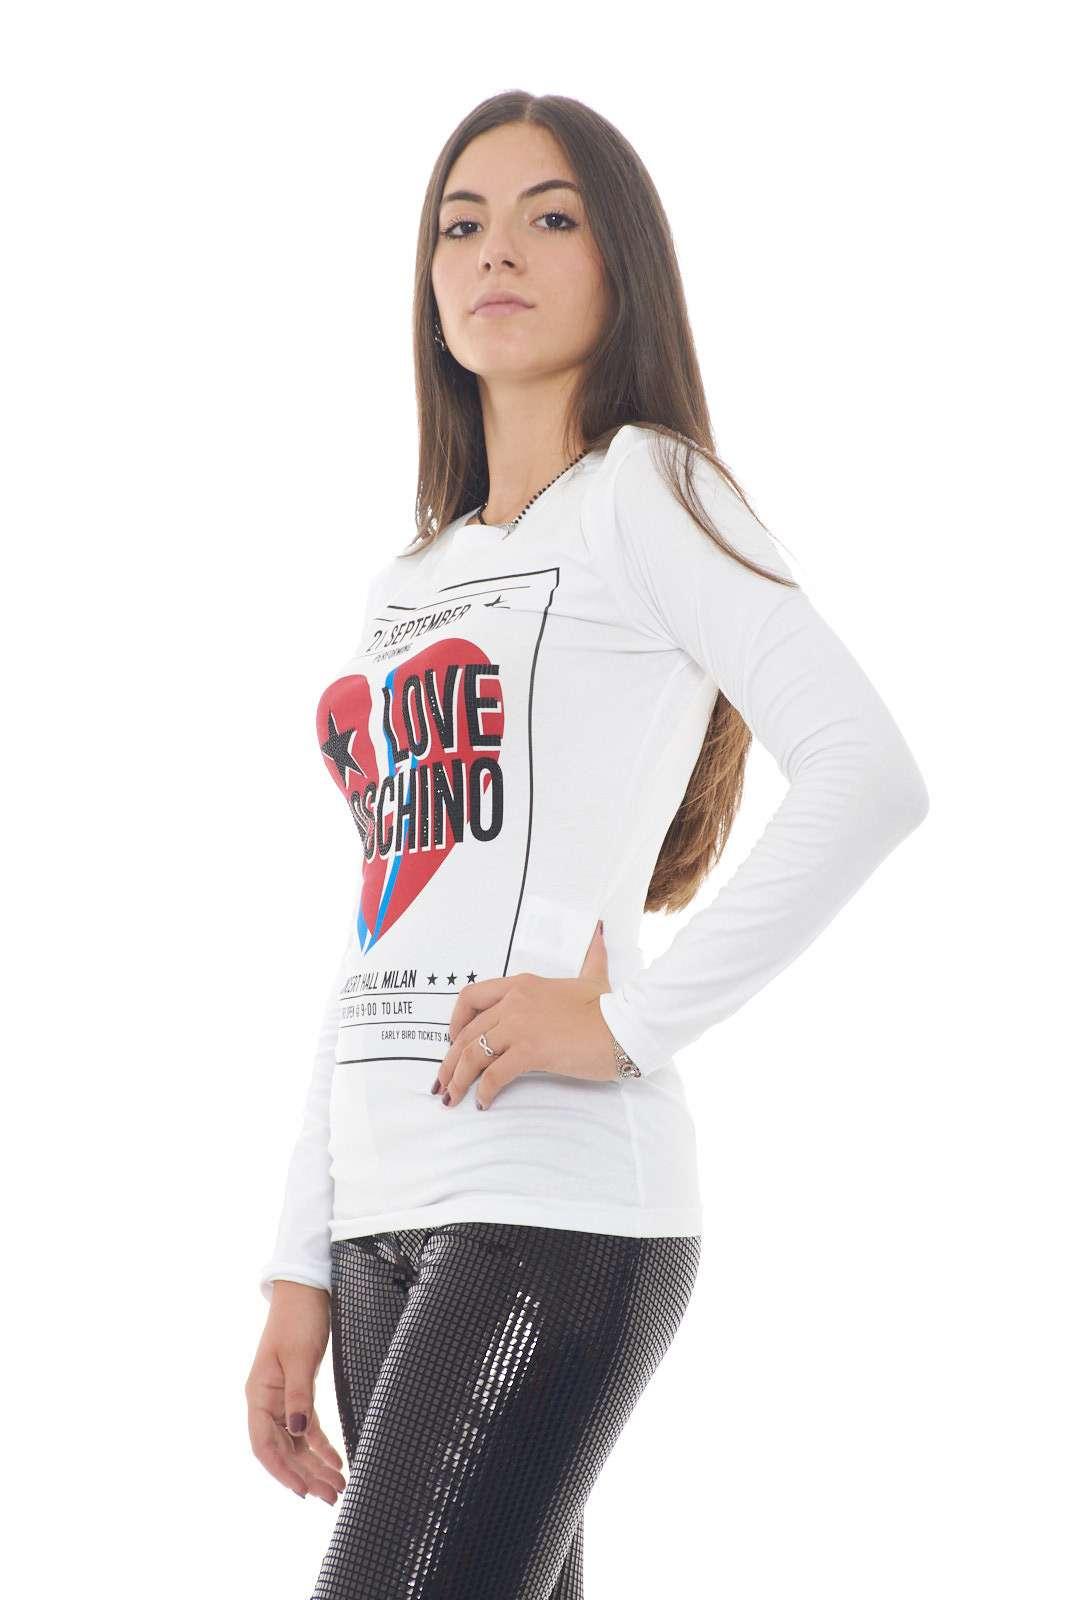 https://www.parmax.com/media/tmp/catalog/product/a/i/AI-outlet_parmax-maglia-donna-Moschino-W%204%20G52%2015%20E%201951-B.jpg